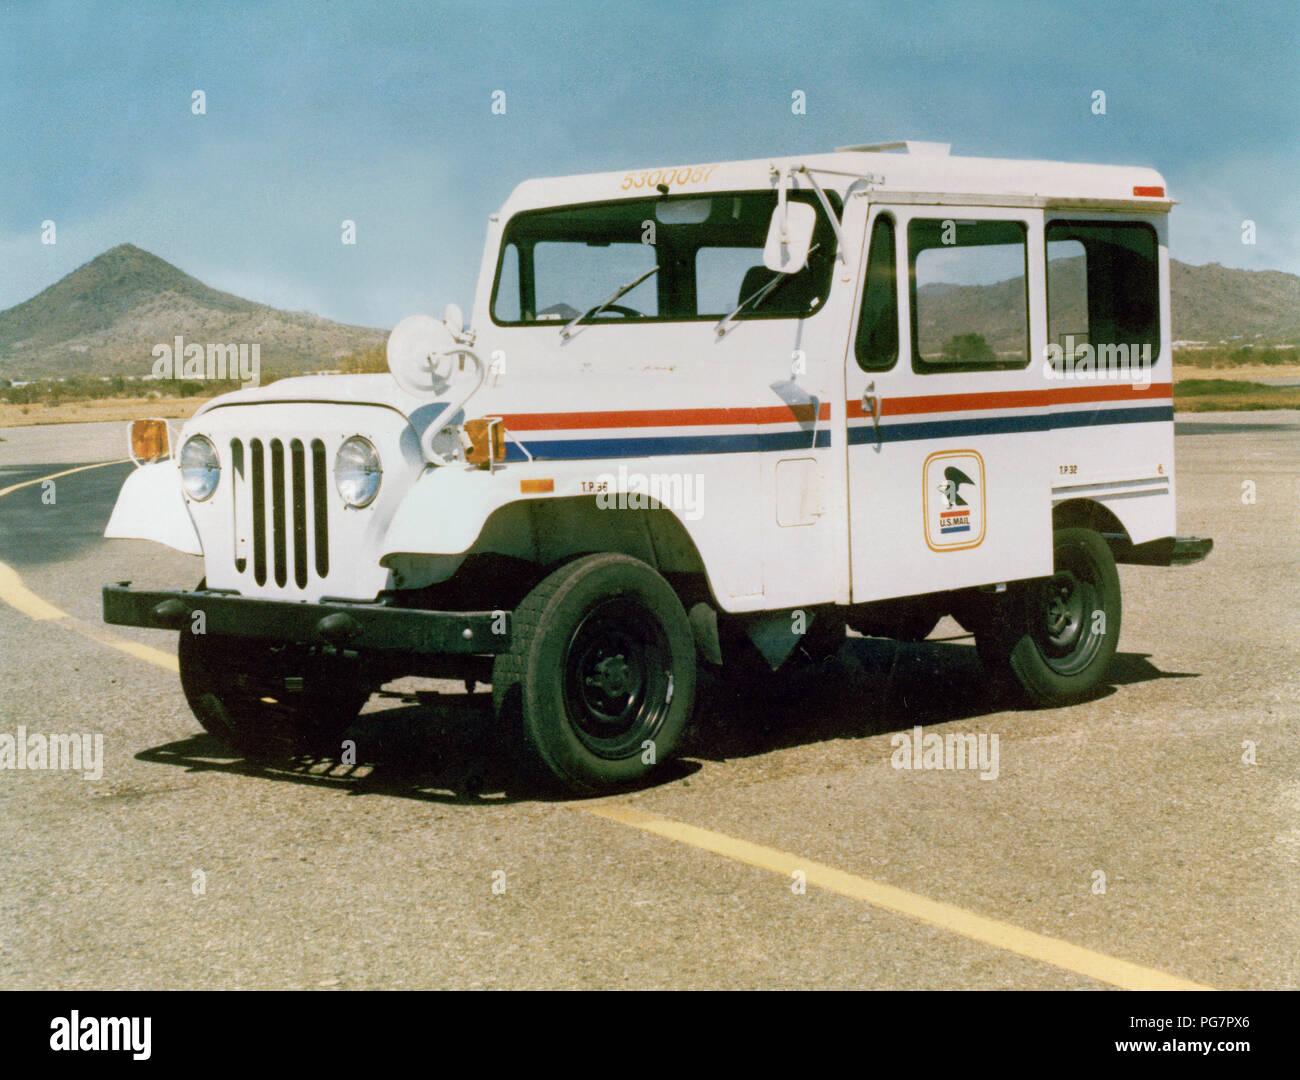 1977 Electric Car - Stock Image